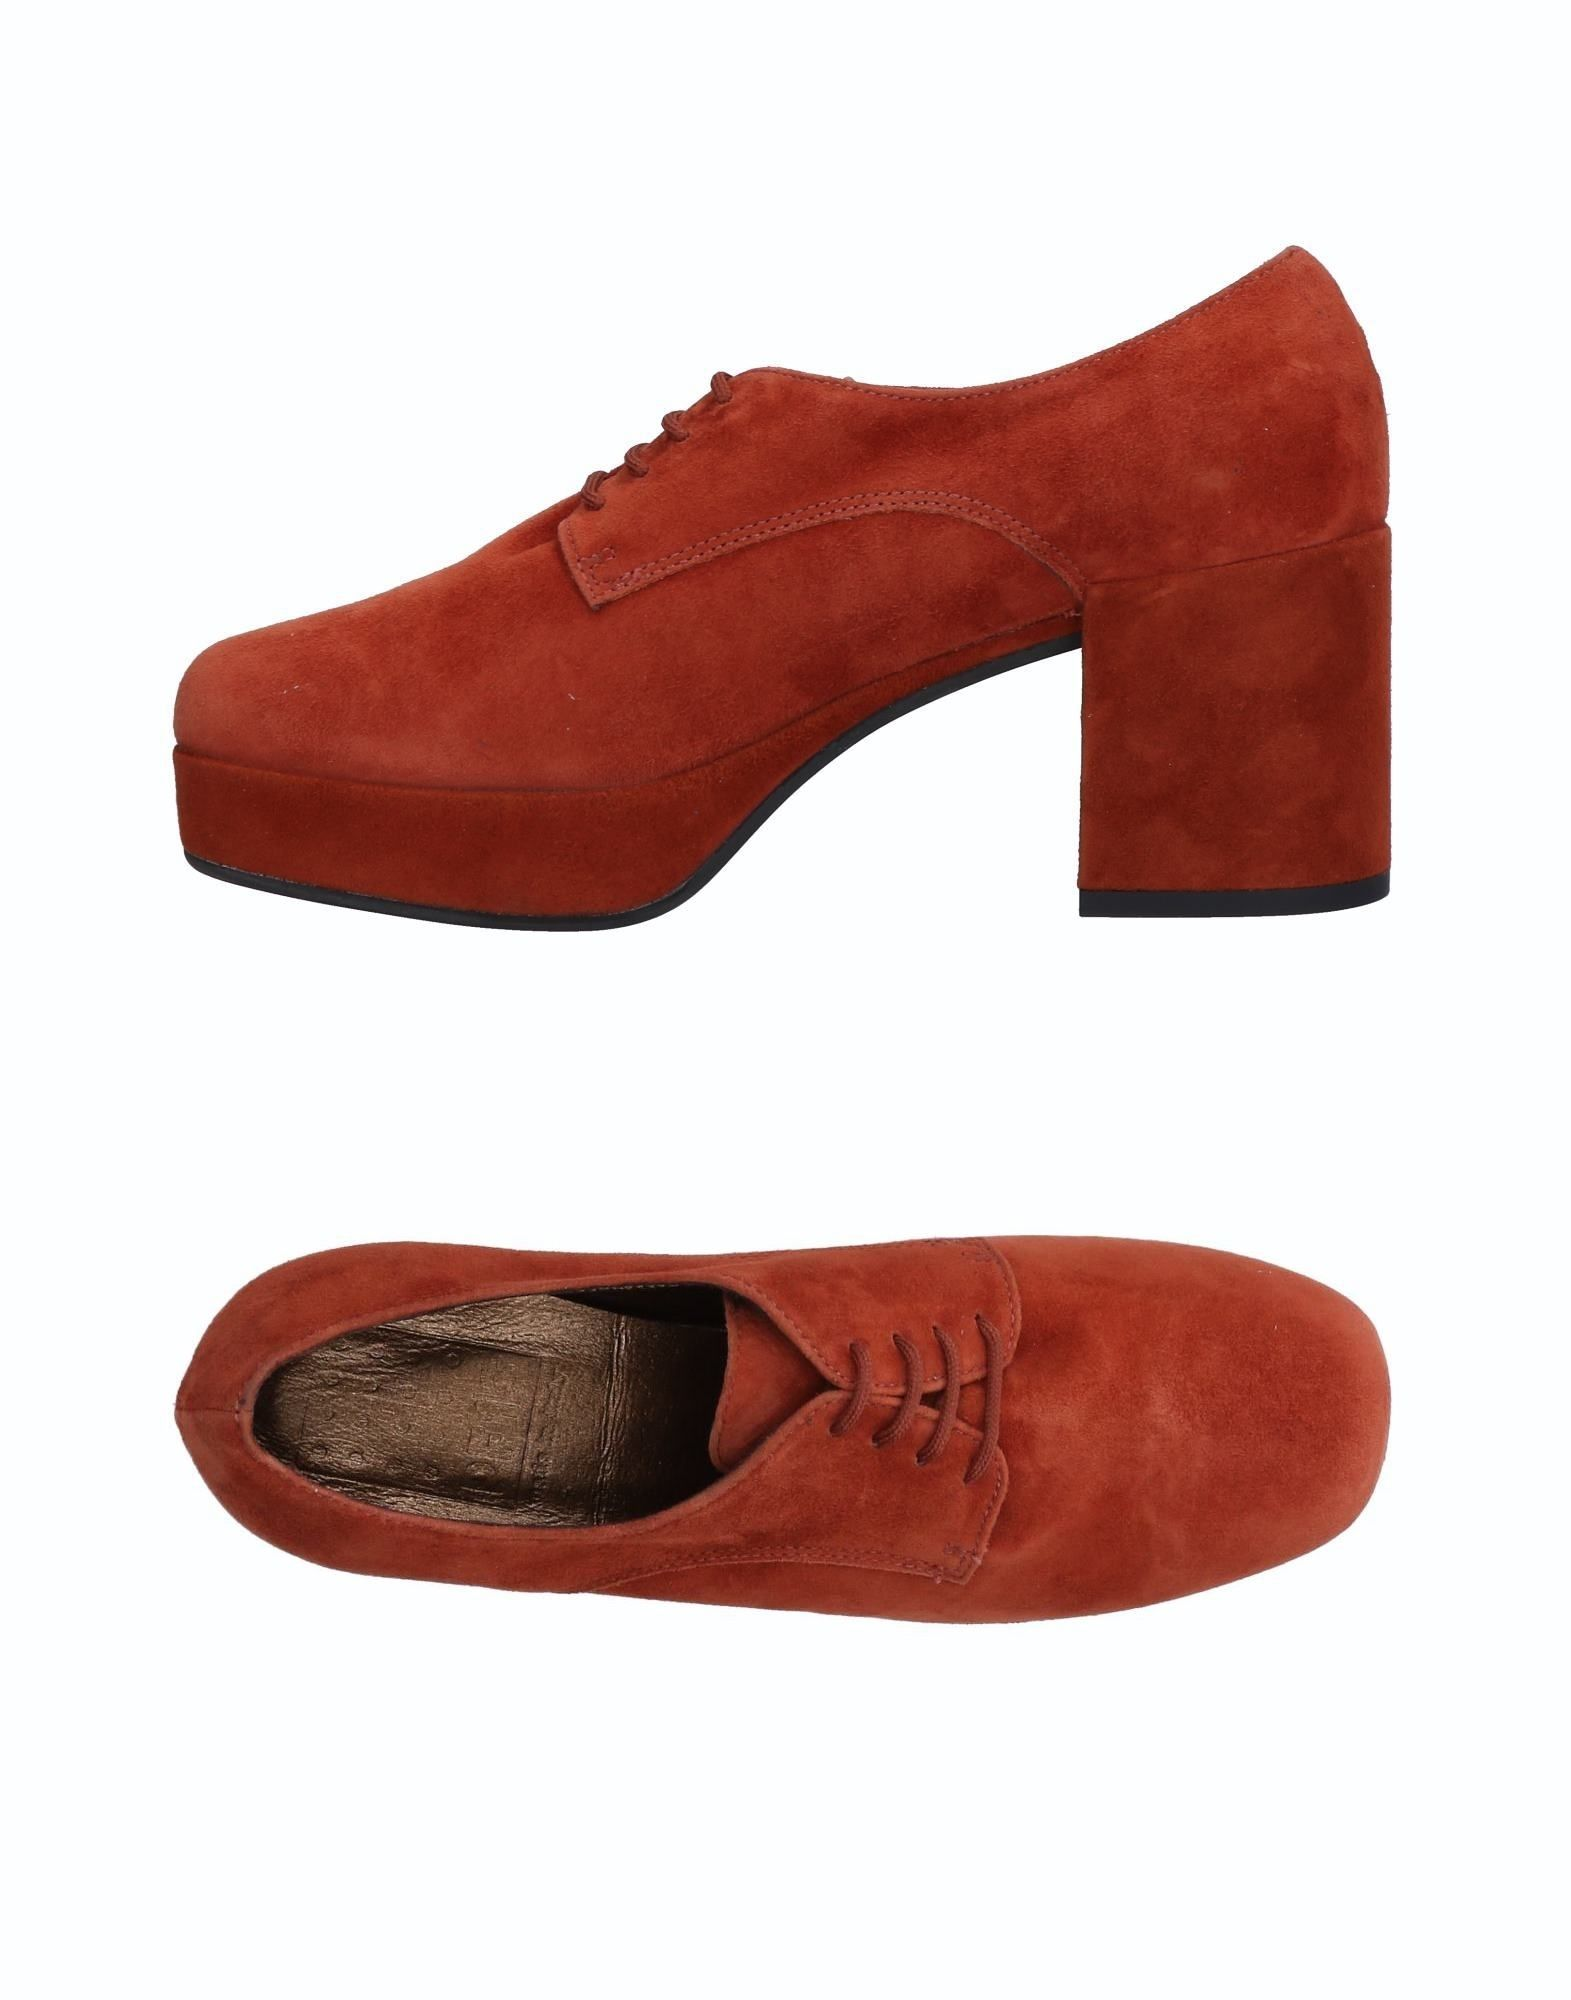 Фото - PF16 Обувь на шнурках обувь на высокой платформе dkny